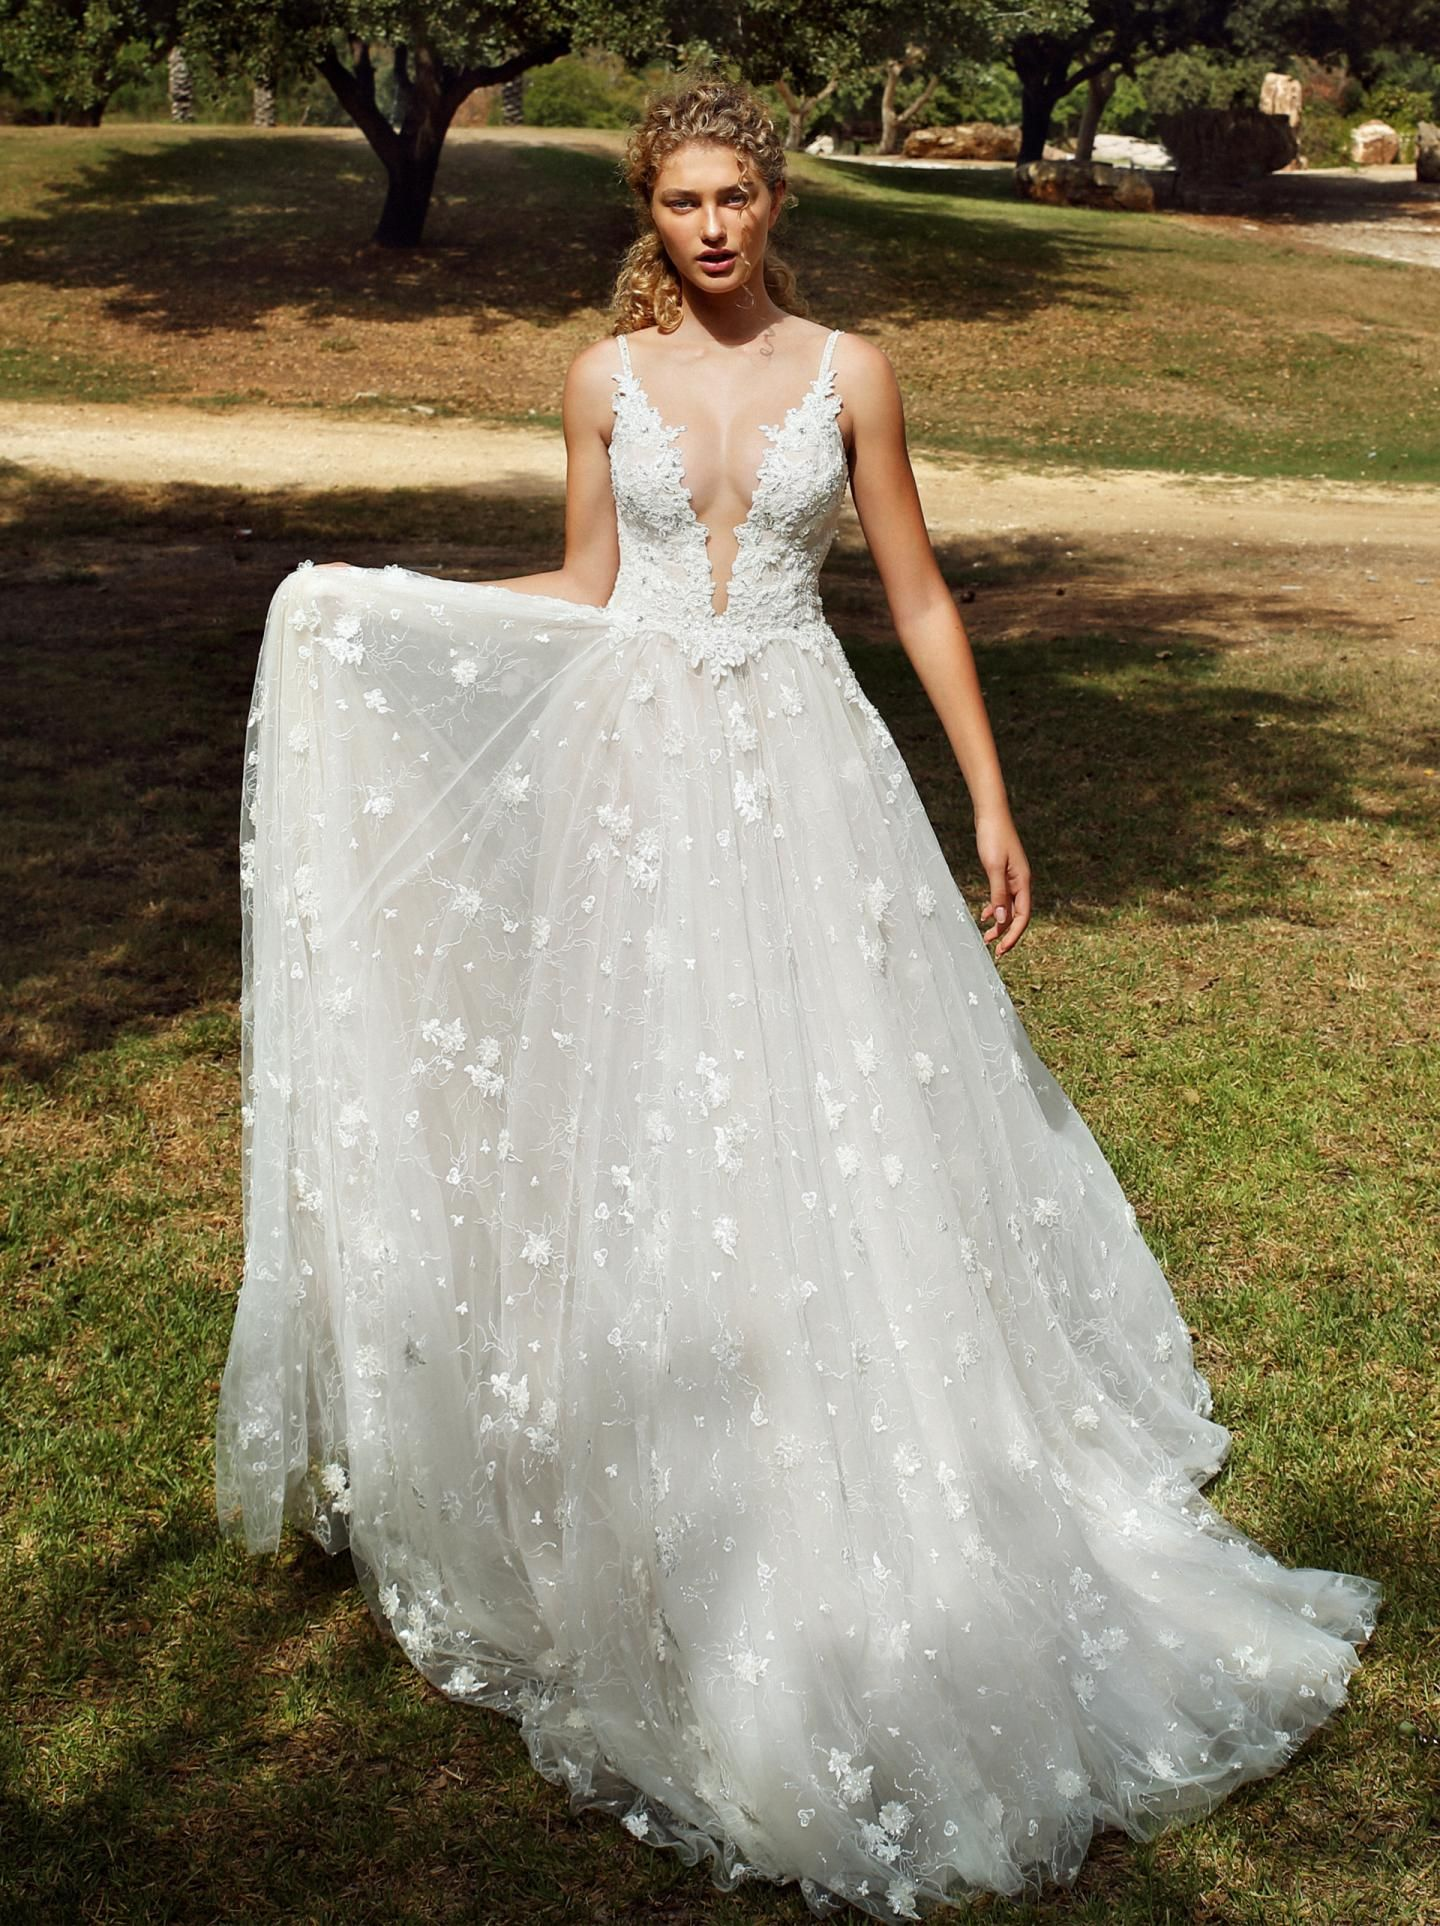 G 204 Collection No Vii Bridal Dresses Galia Lahav Sparkly Wedding Dress Galia Lahav Wedding Dress Wedding Dress Necklines [ 1926 x 1440 Pixel ]